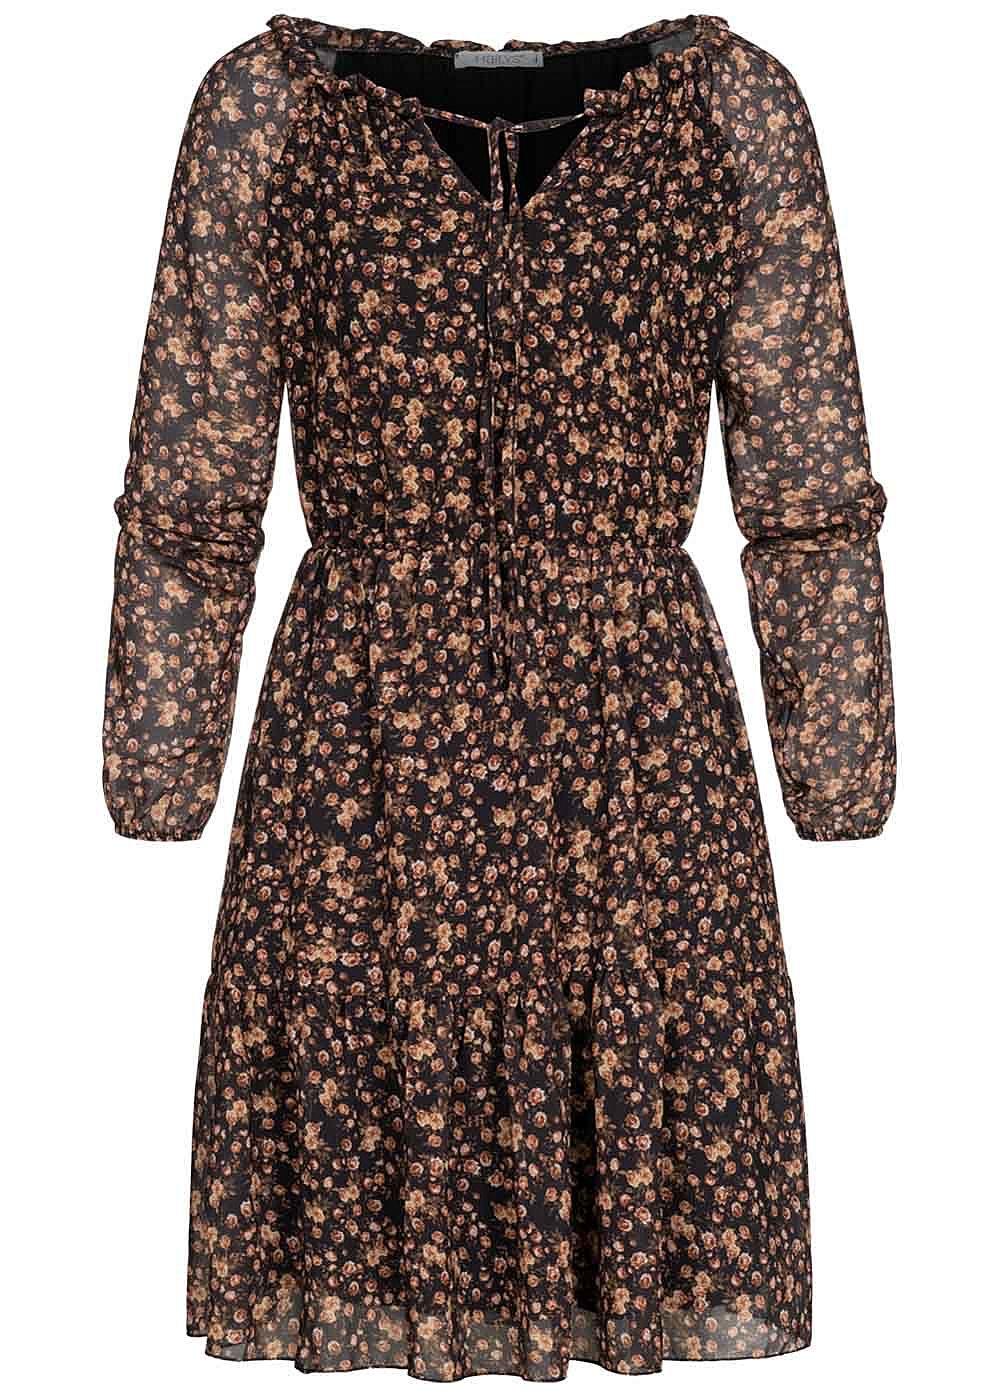 Hailys Damen Chiffon Mini Kleid Blumen Print 18-lagig schwarz braun